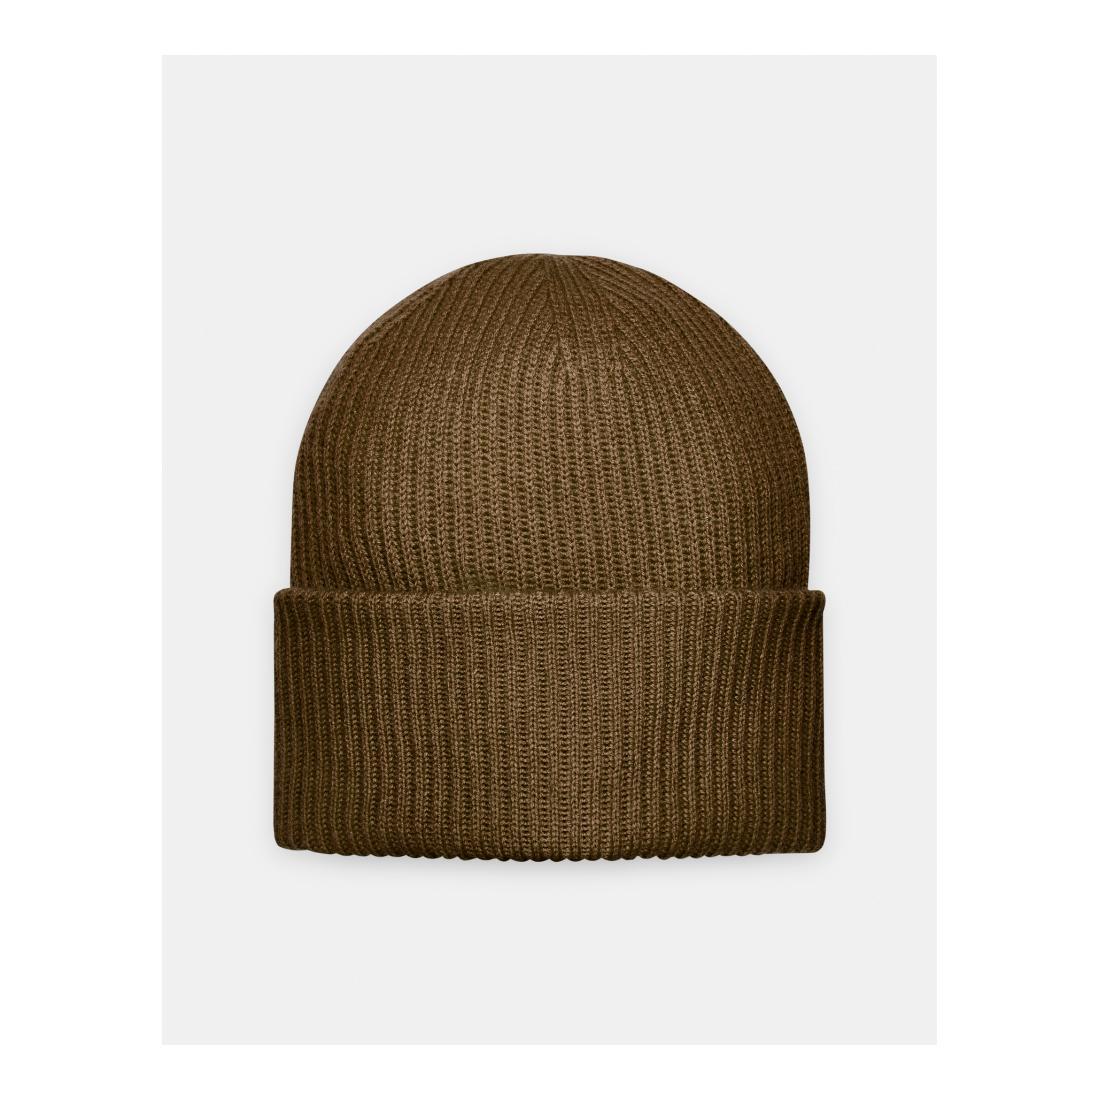 Someday Mützen Stirnband/Handschuhe Berta cap